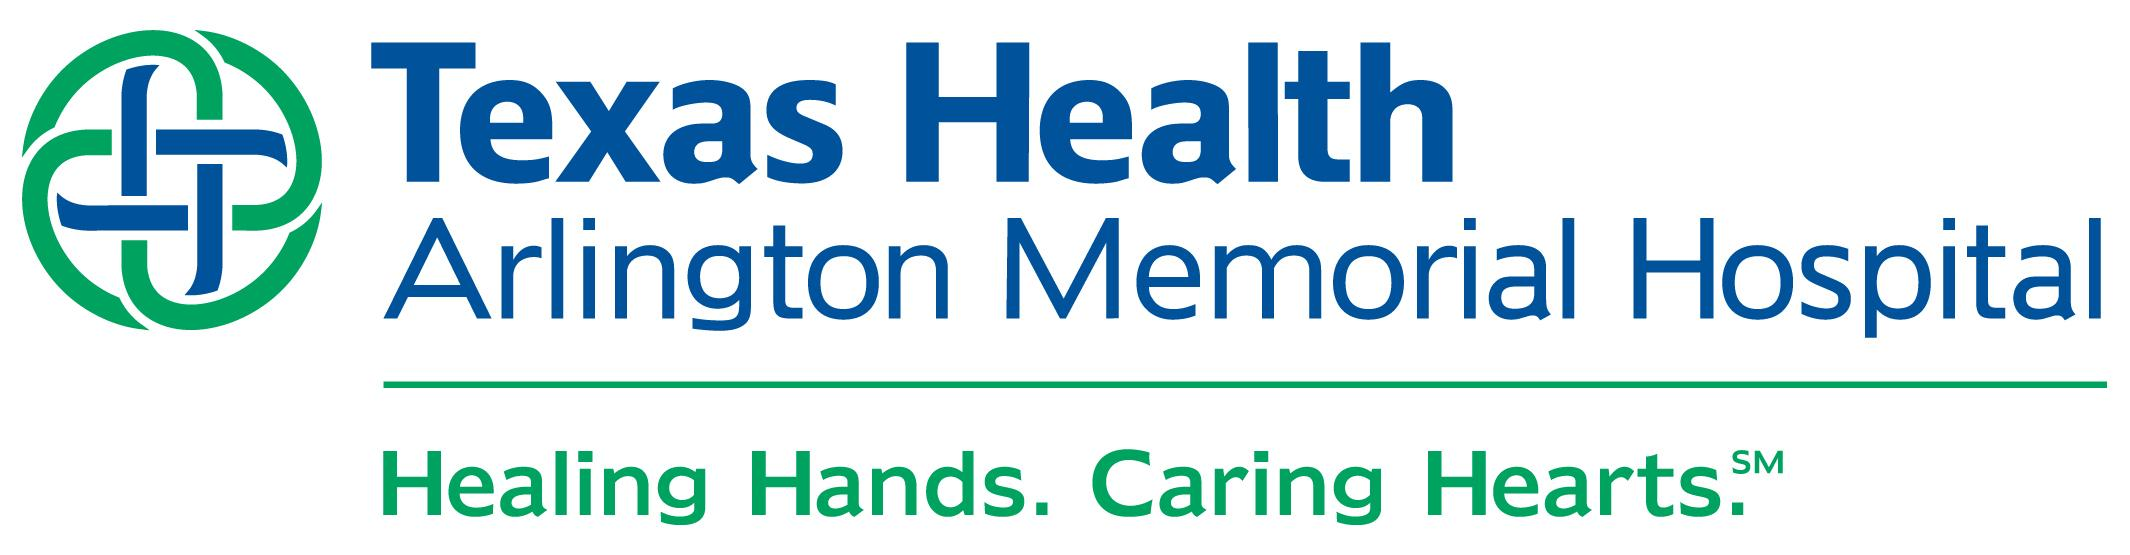 Seeking an Ob/Gyn in Arlington, Texas | Texas Health